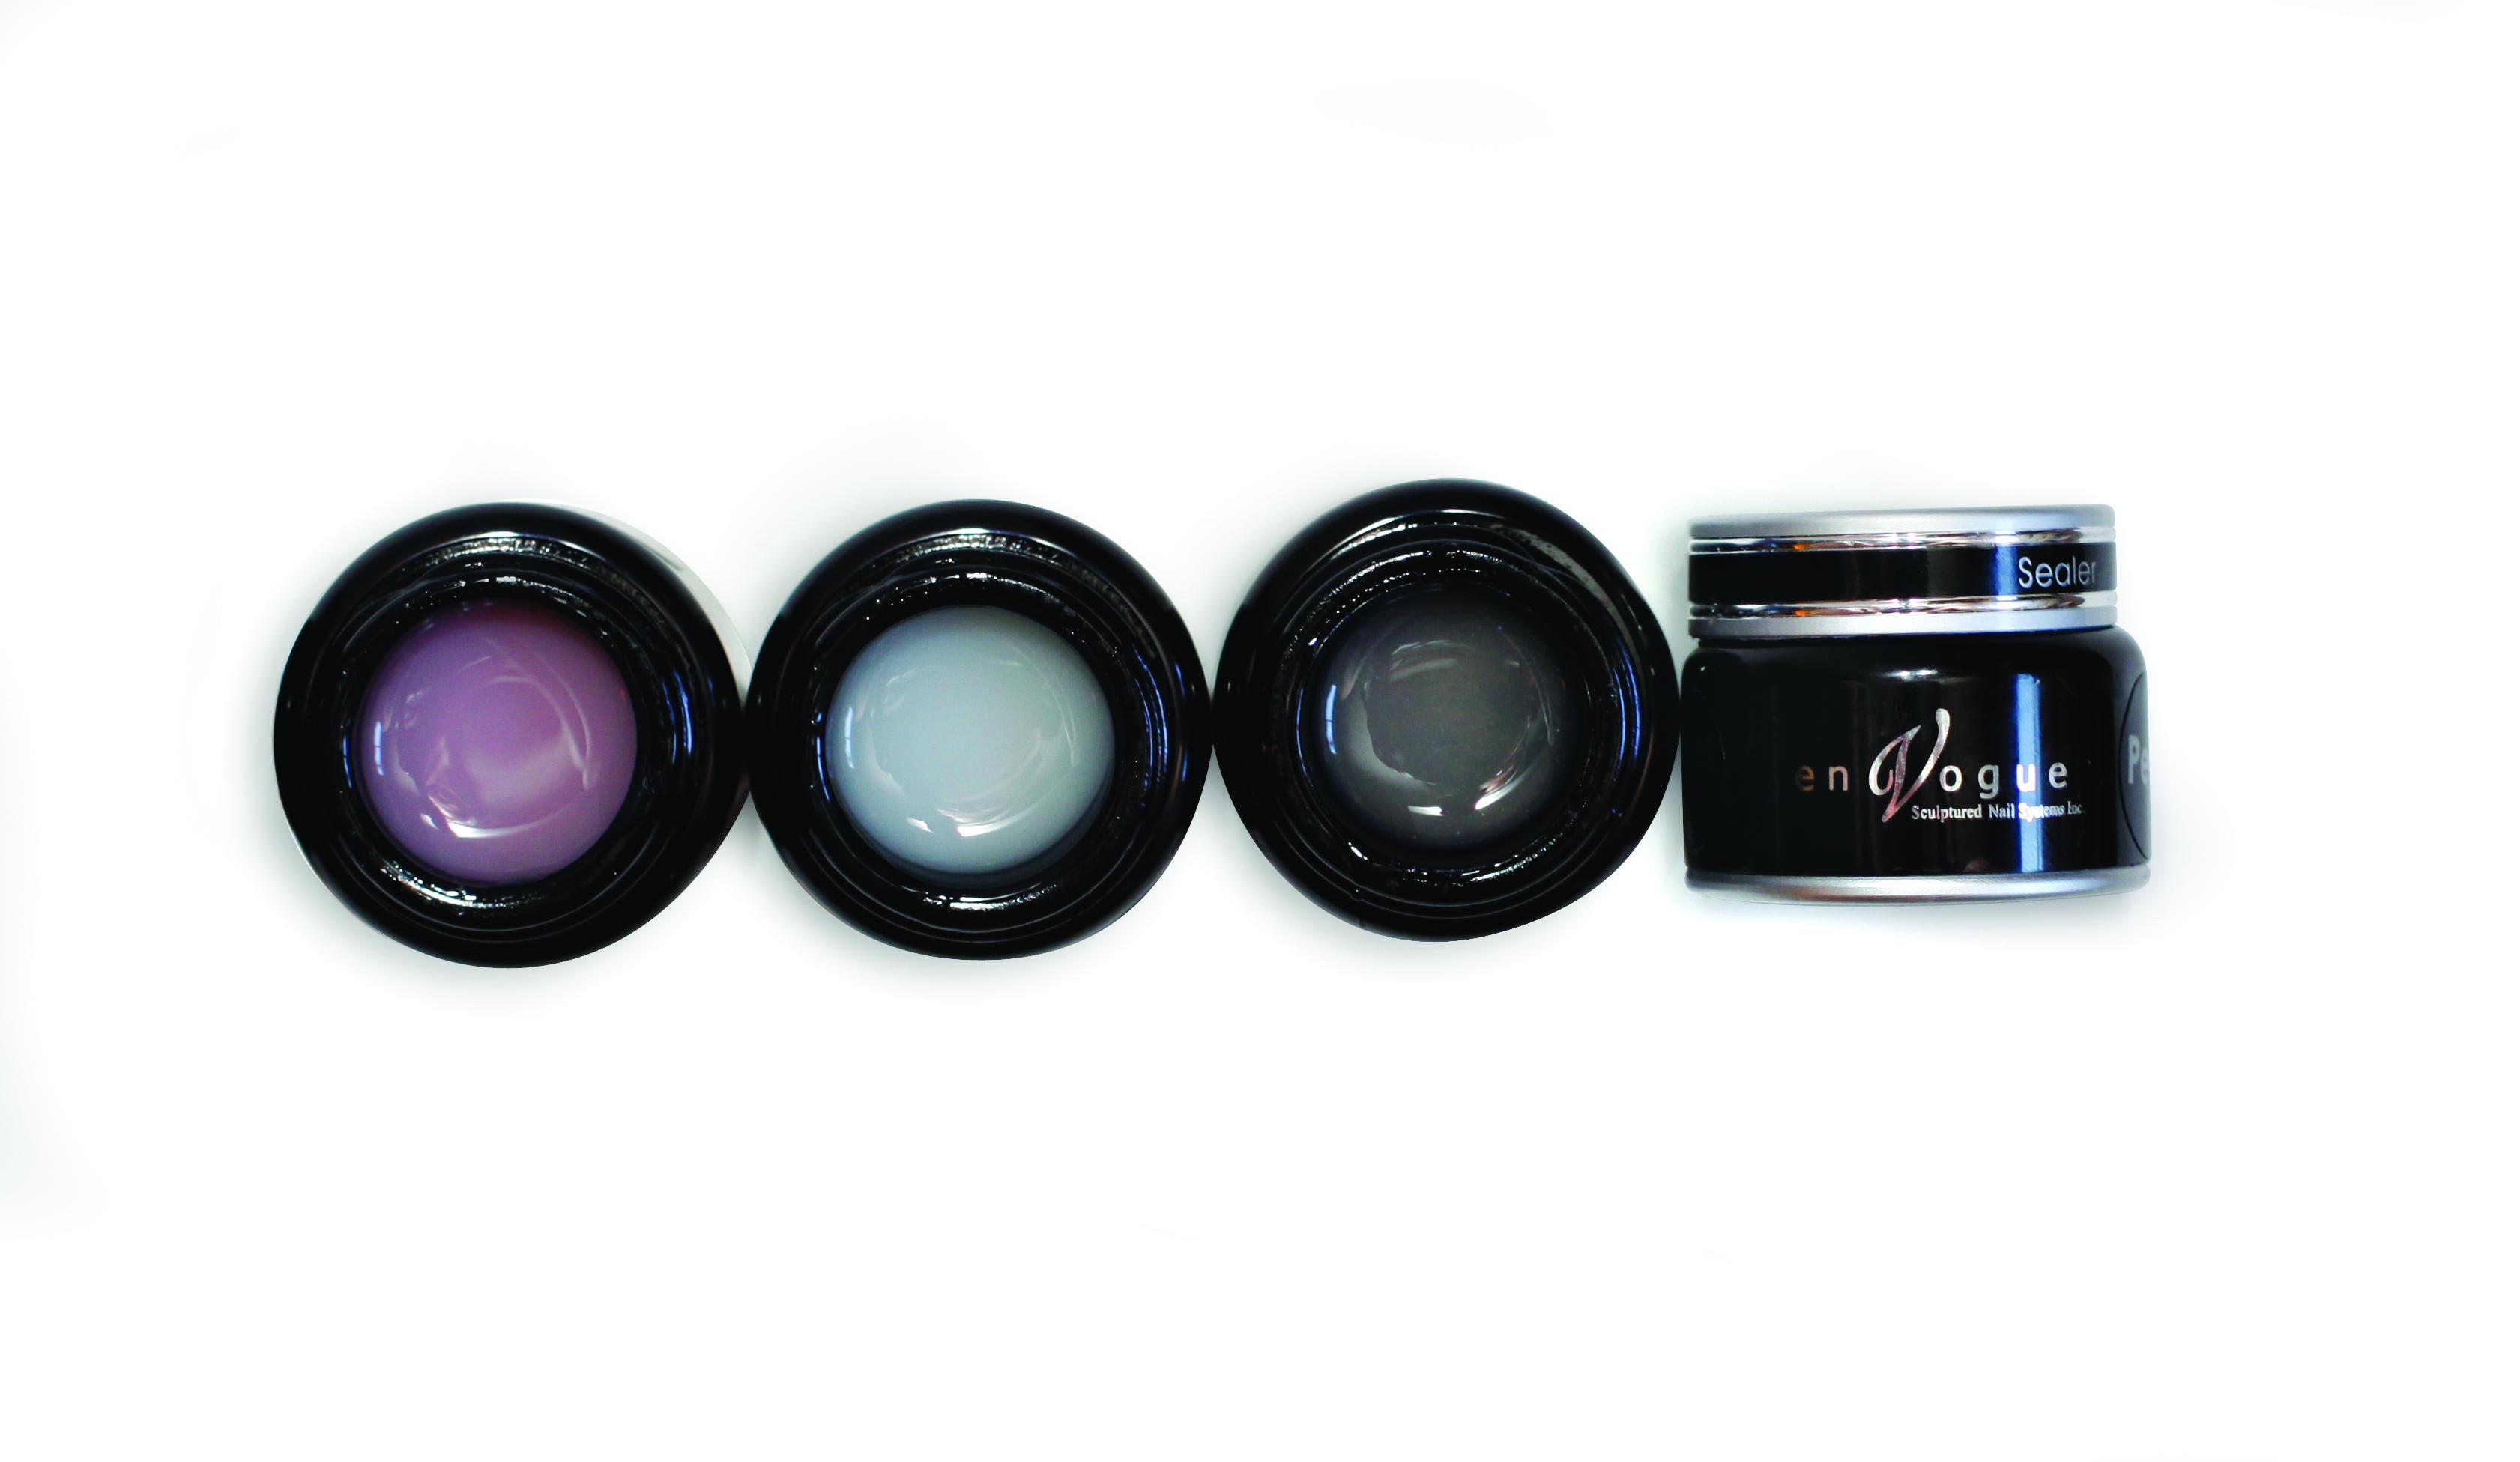 Extender Modeling Resins, Sealers, and Colour Gels